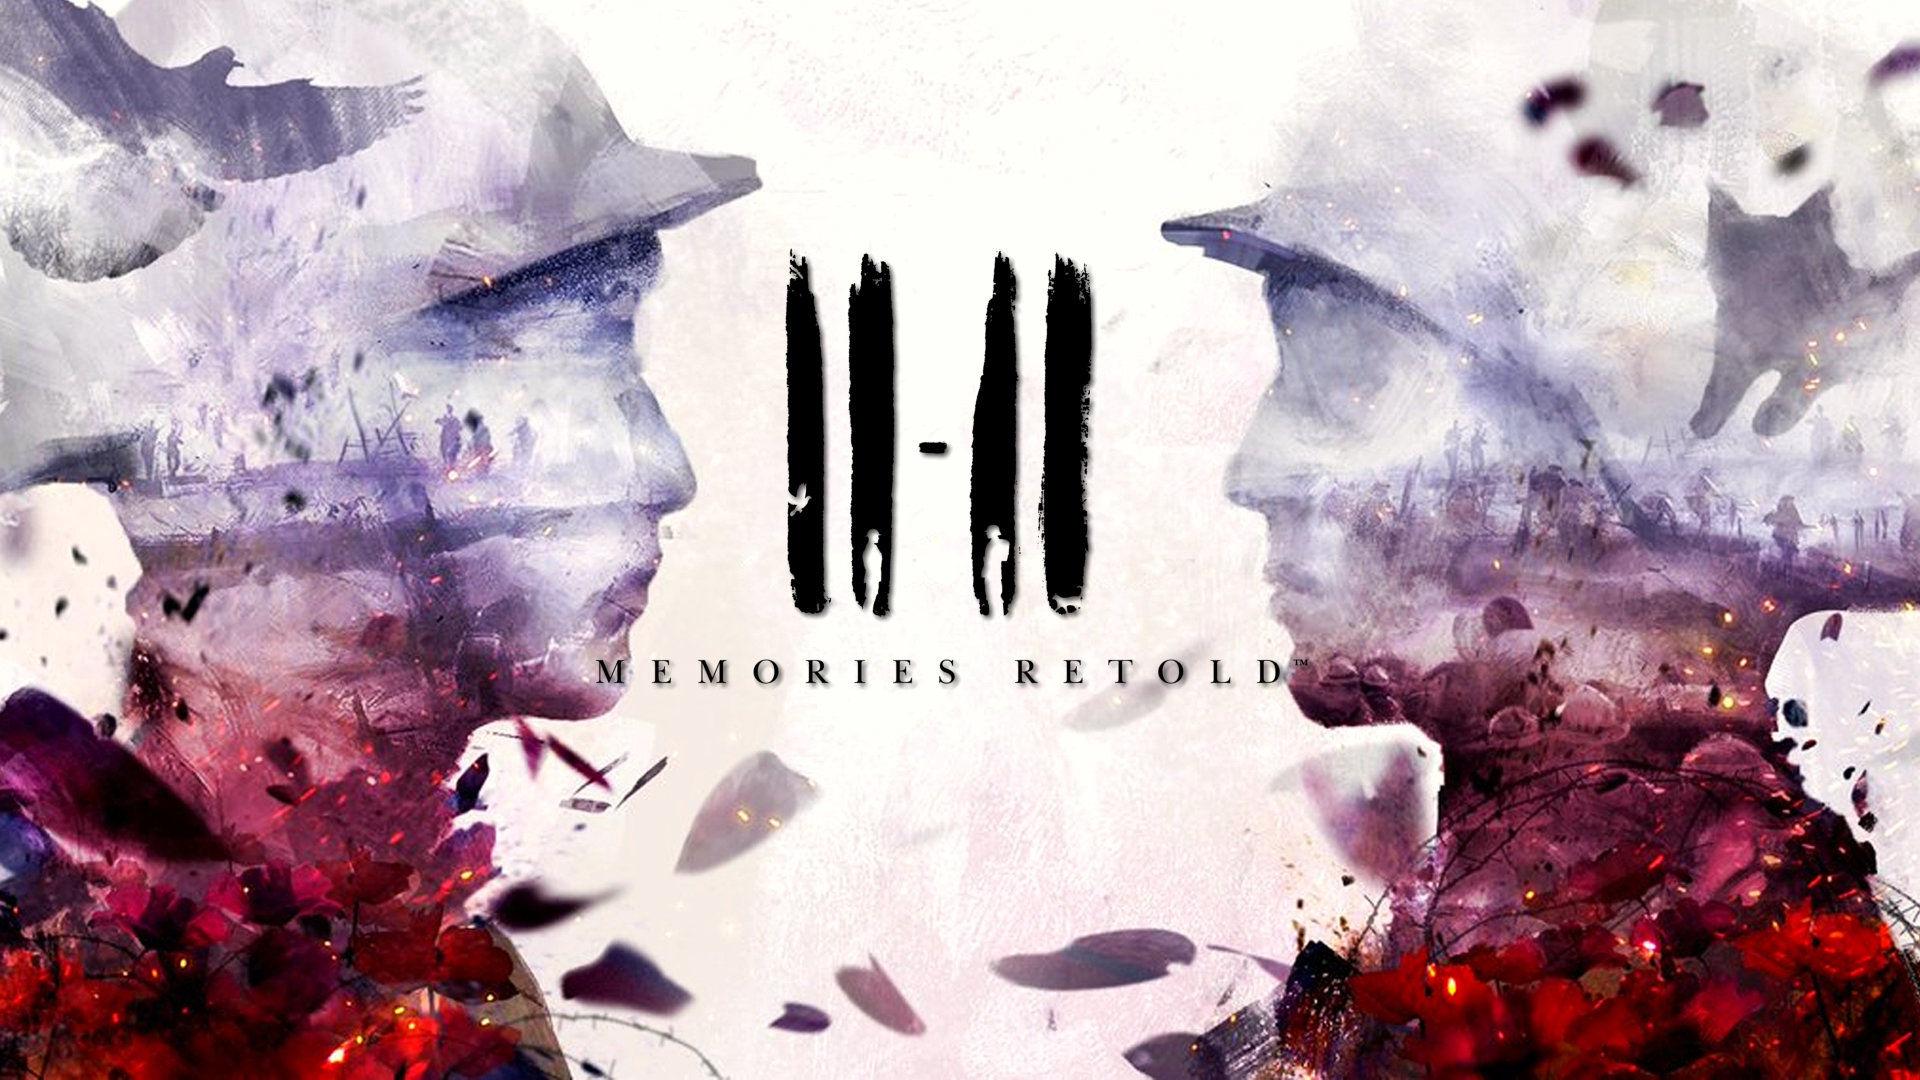 11-11 Memories Retold Sistem Gereksinimleri